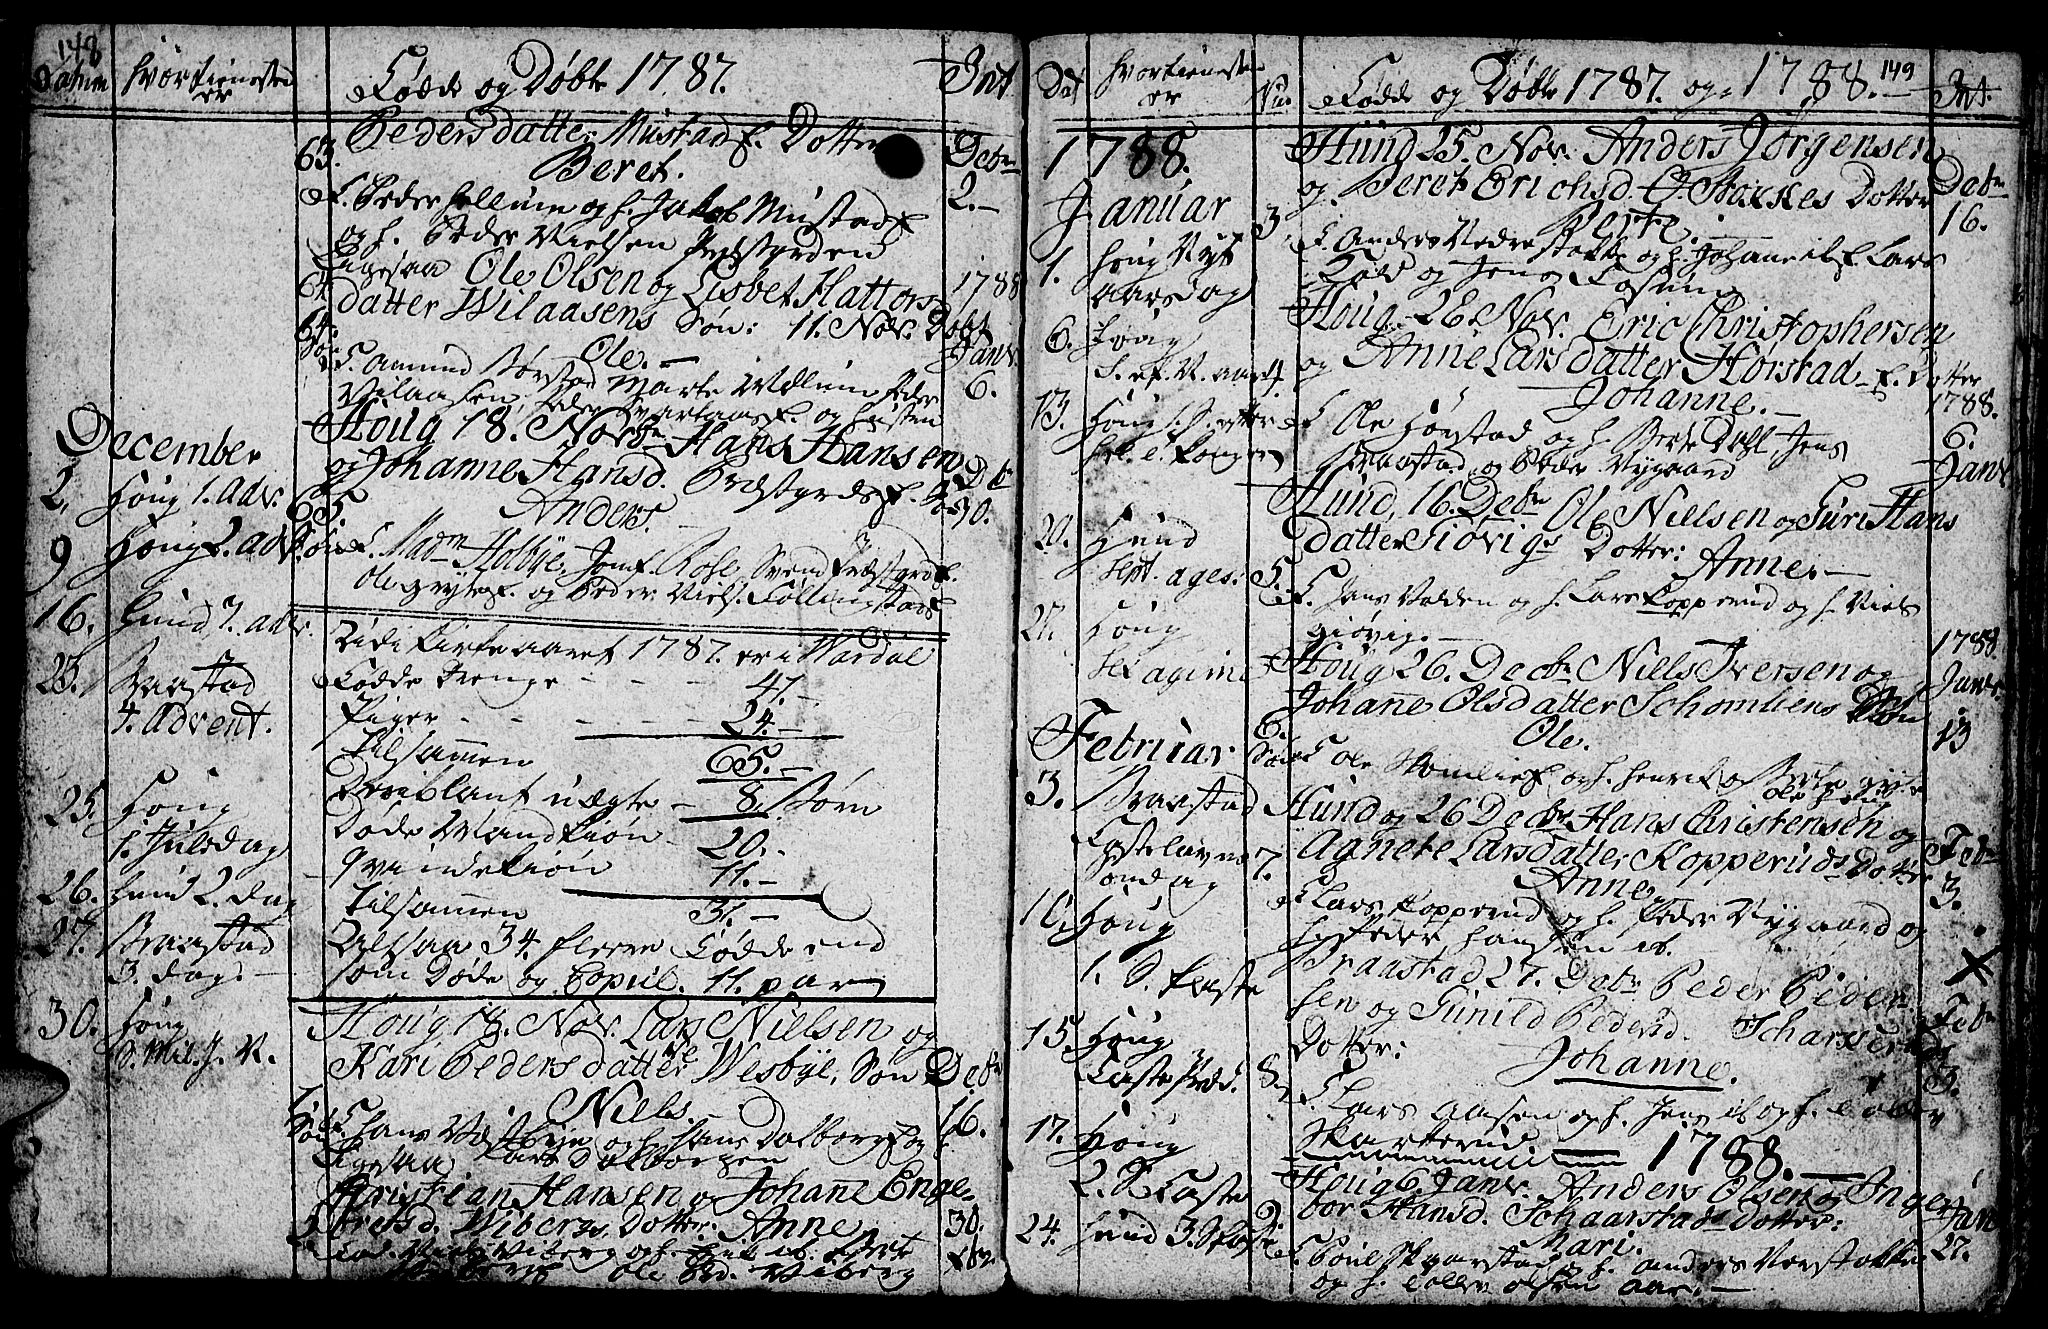 SAH, Vardal prestekontor, H/Ha/Hab/L0001: Klokkerbok nr. 1, 1771-1790, s. 148-149